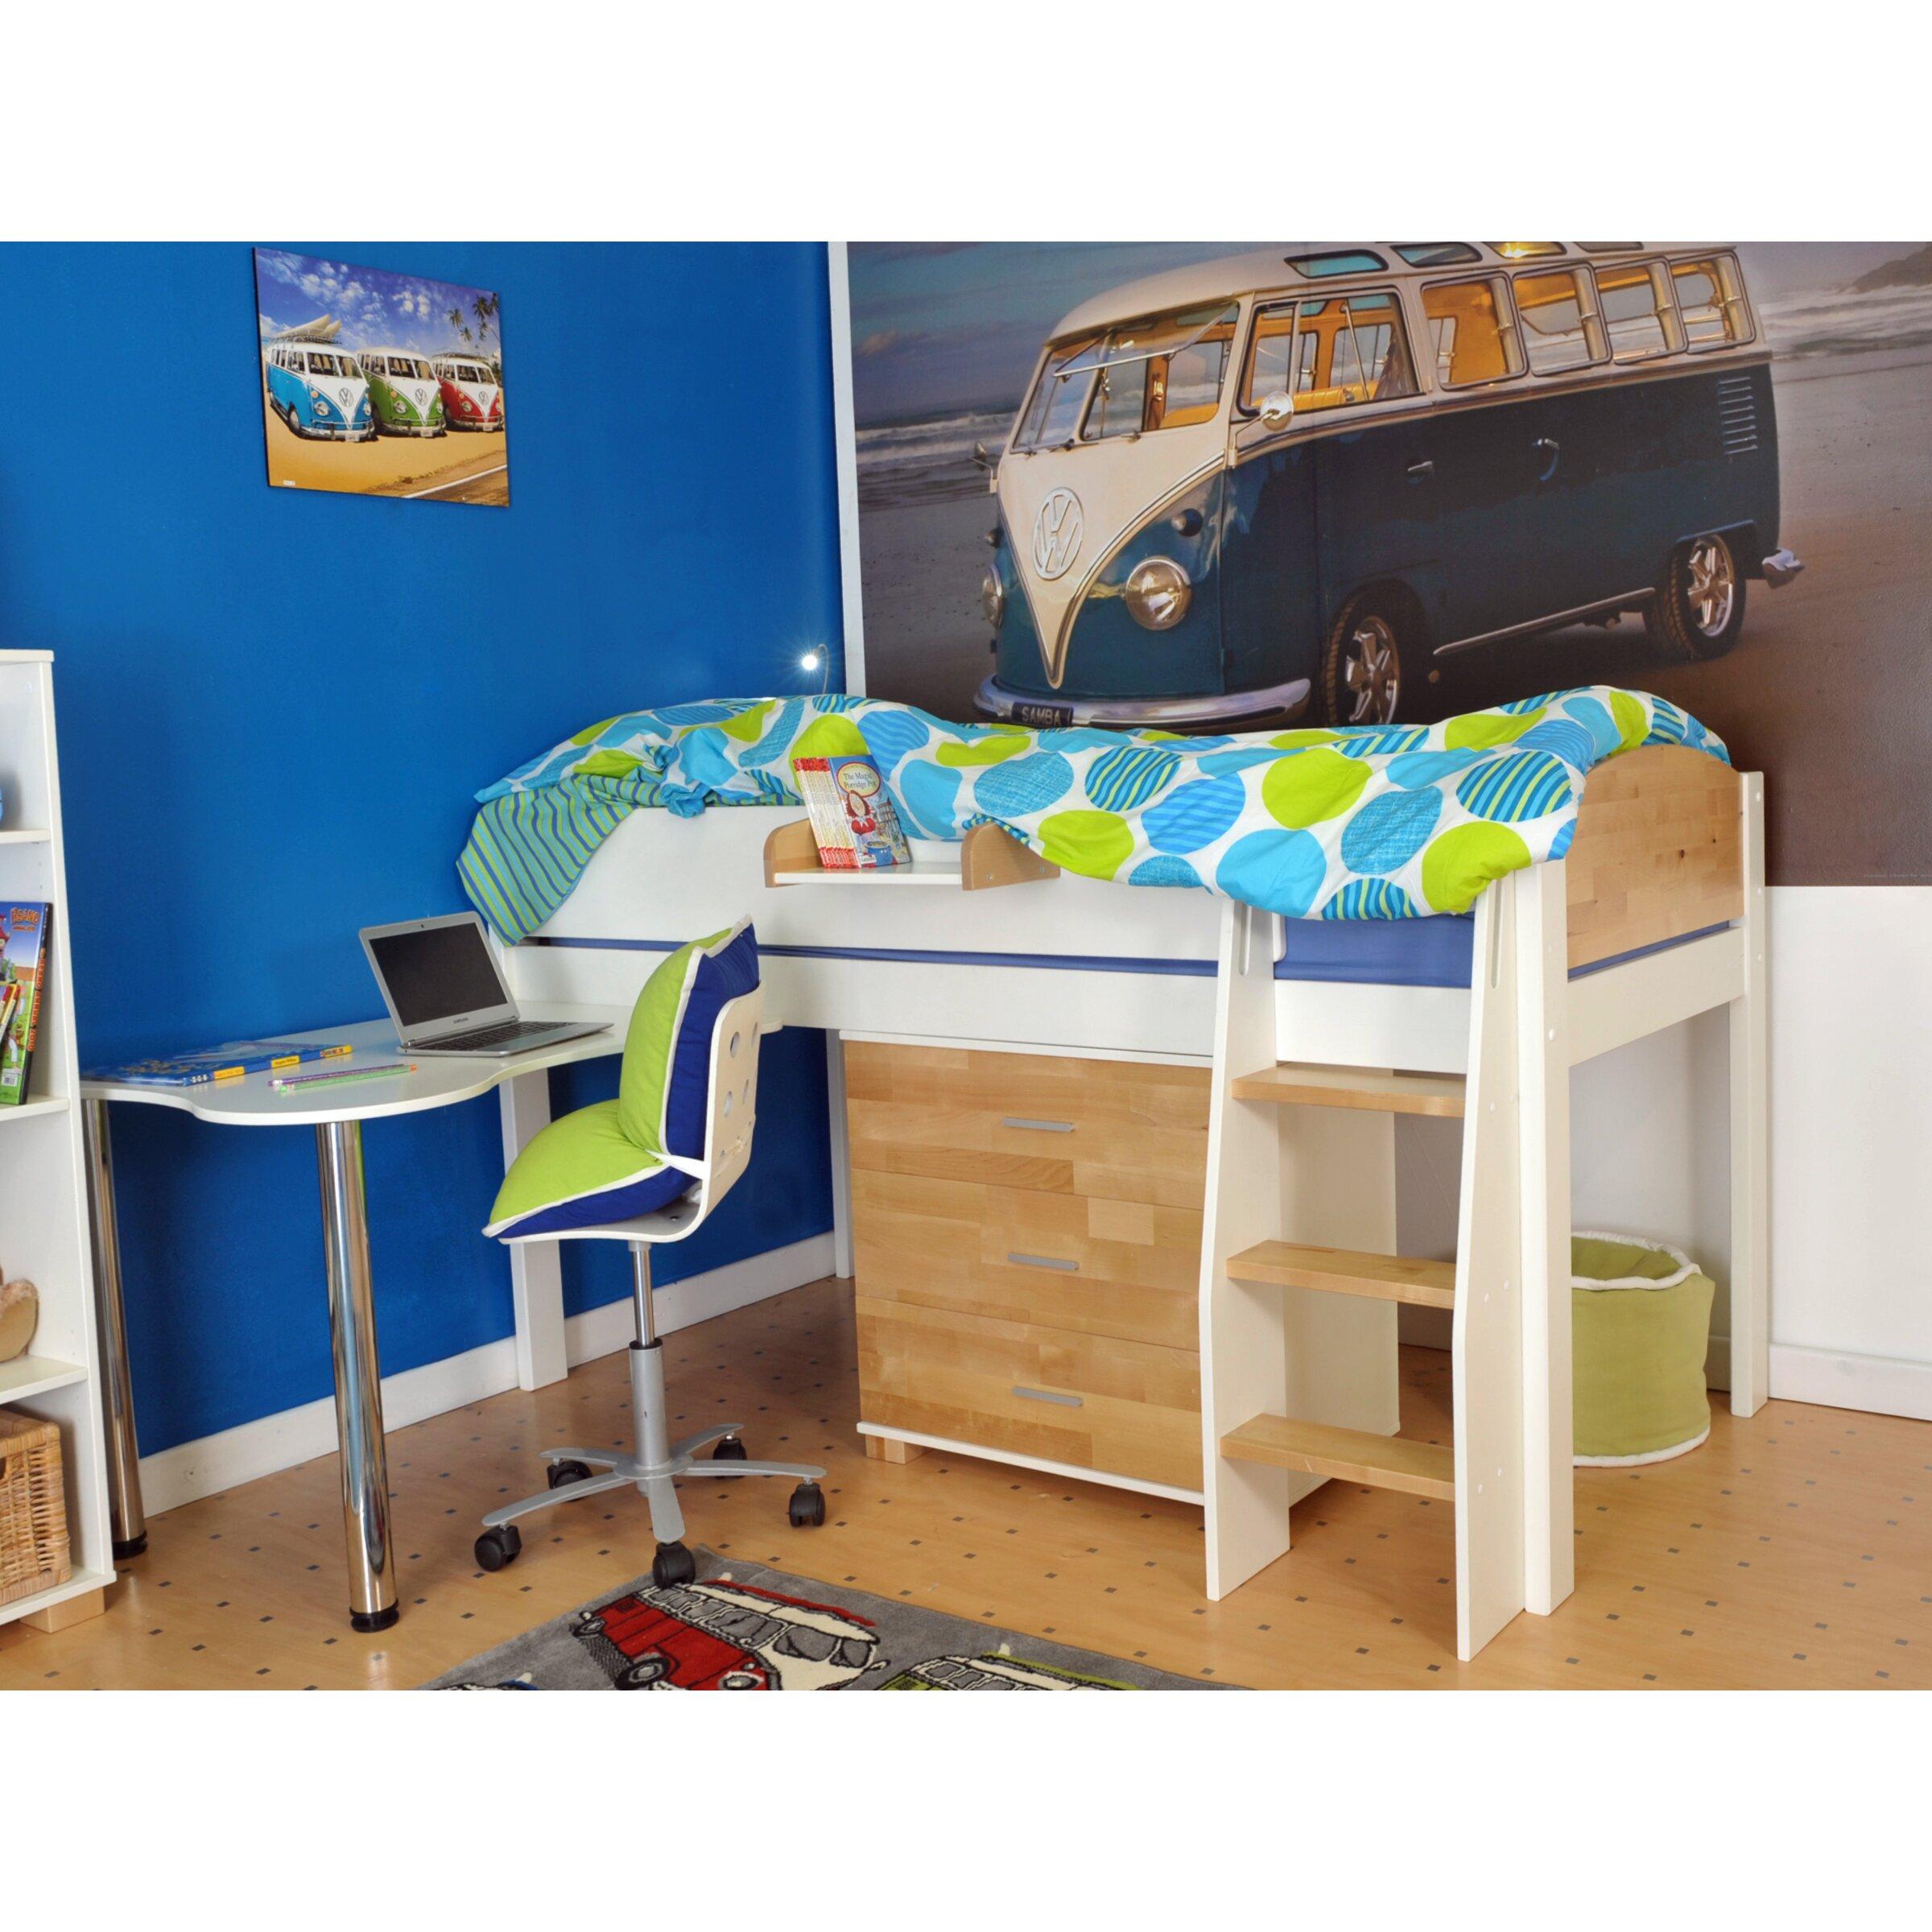 Wrigglebox Norfolk Single High Sleeper Bed with Storage ...